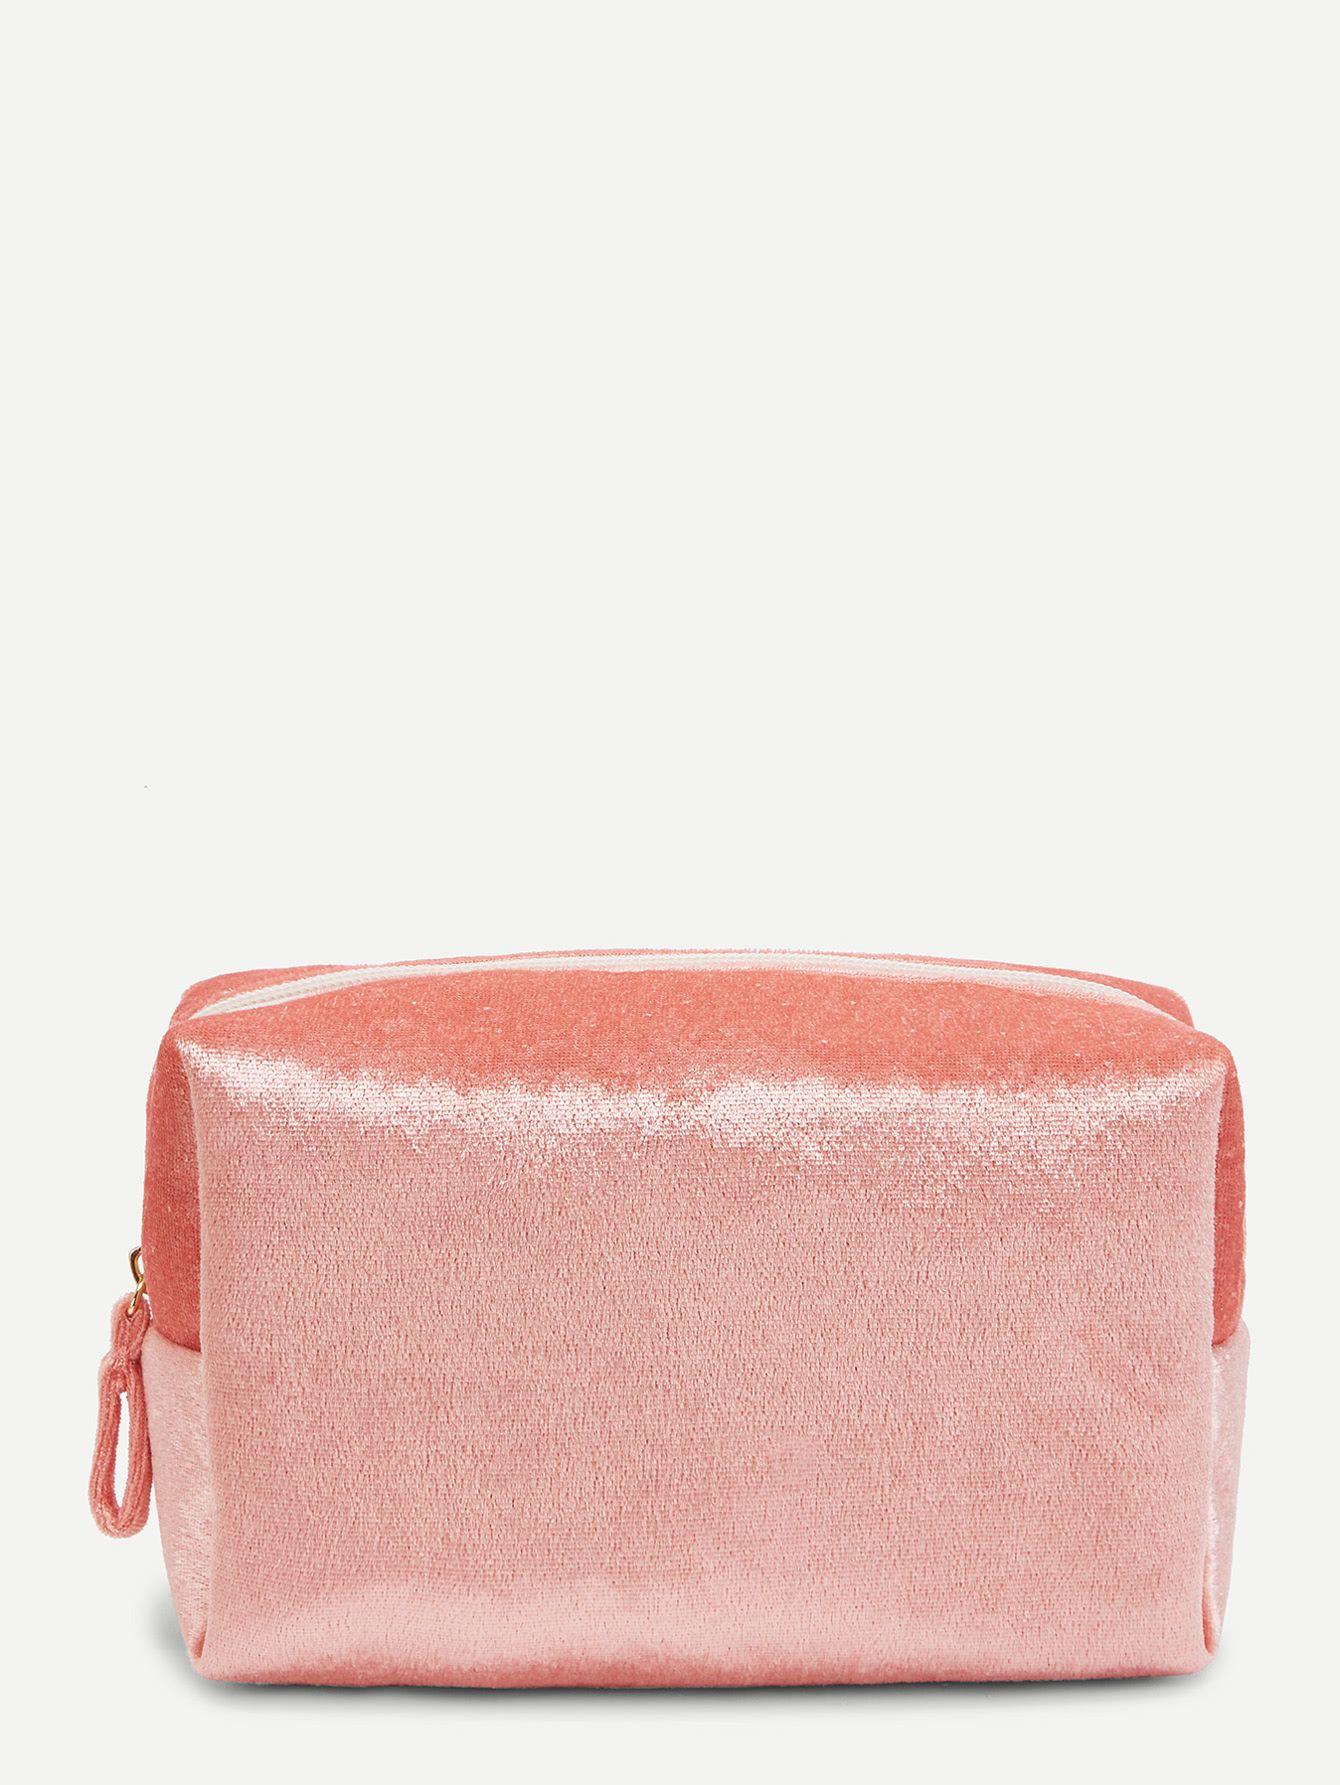 793f23a1a9b6 Velvet Zipper Makeup Bag -SheIn(Sheinside) | Stuff to buy I want ...